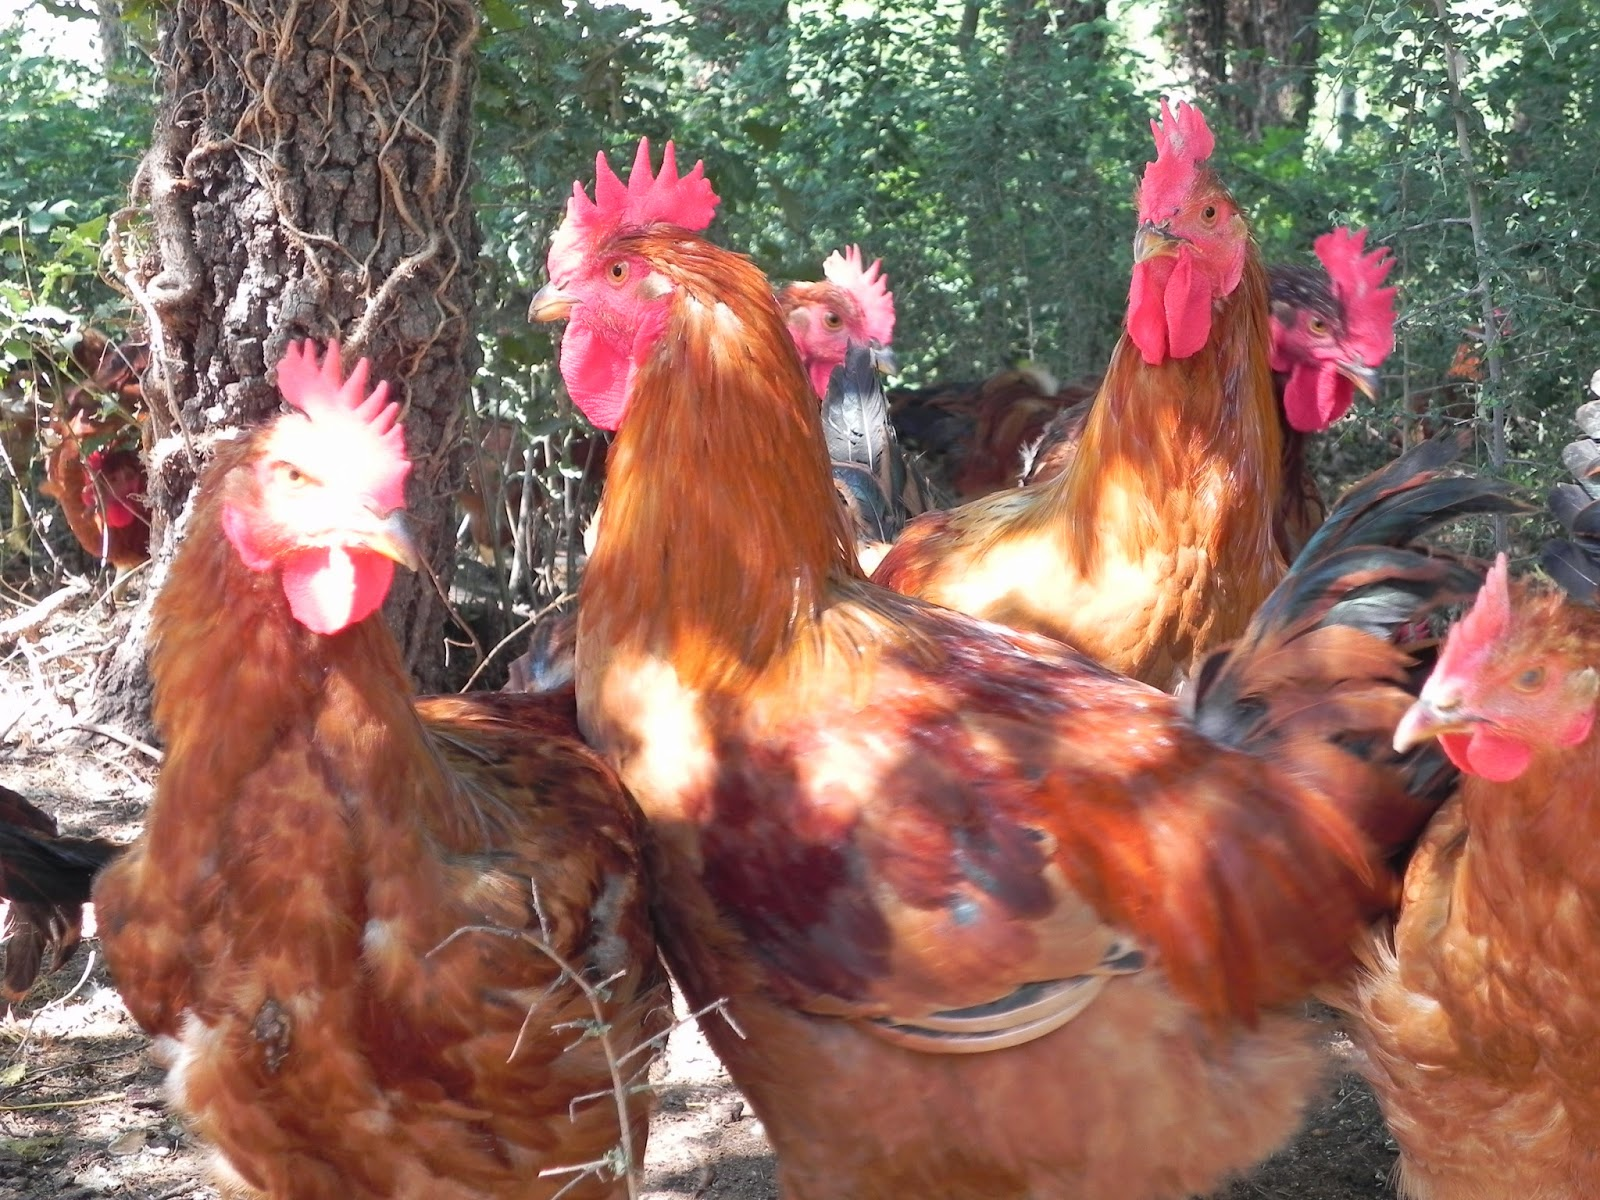 comprar pollastre ecològic online